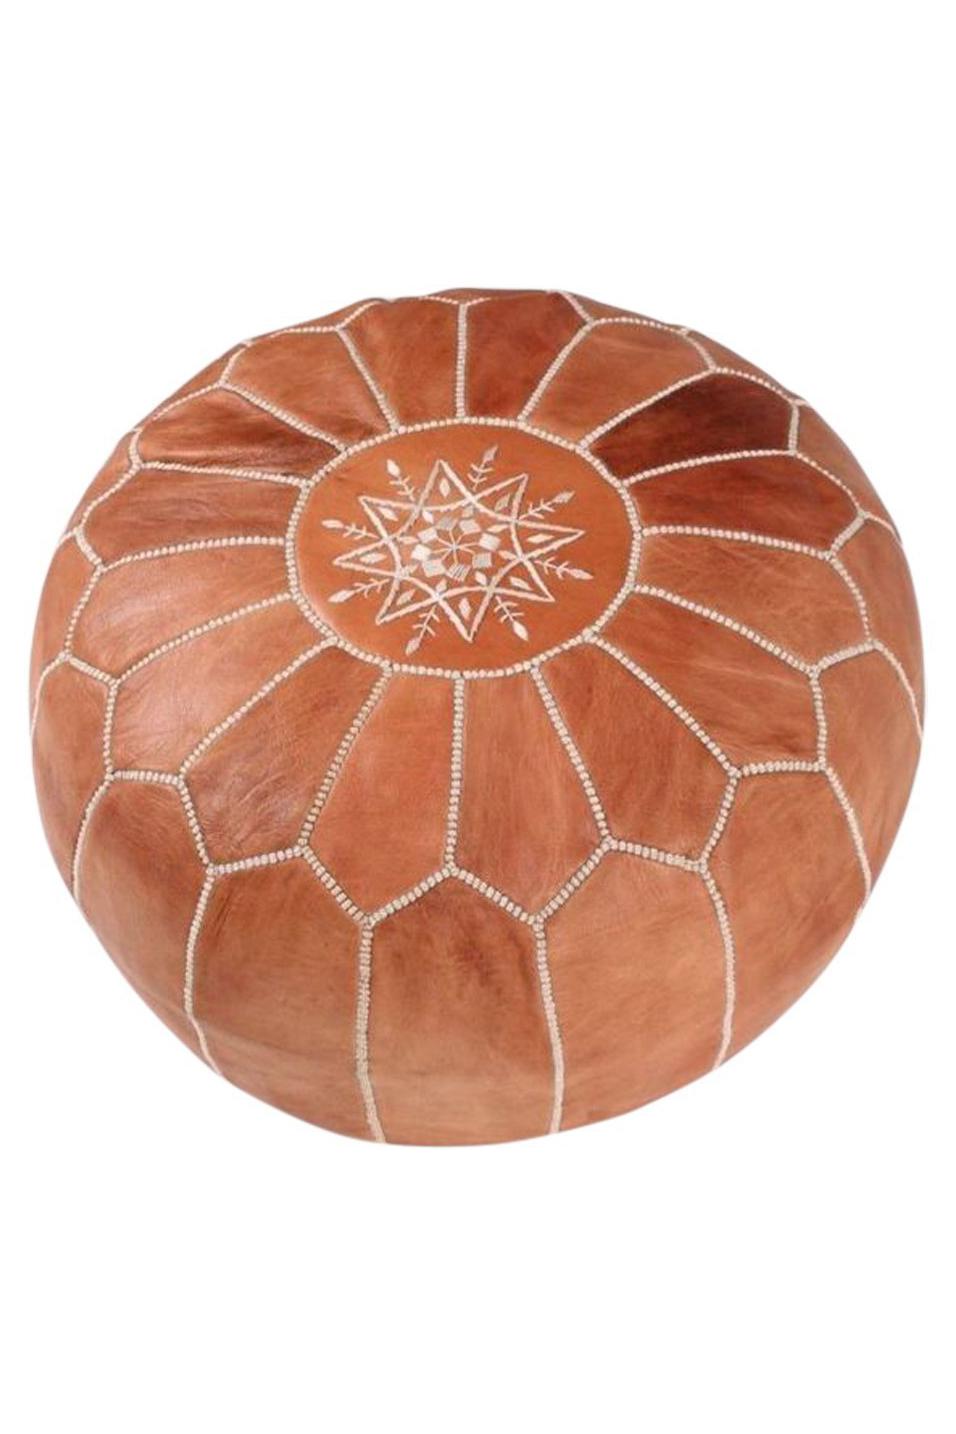 Handmade Leather Footstool Pouf